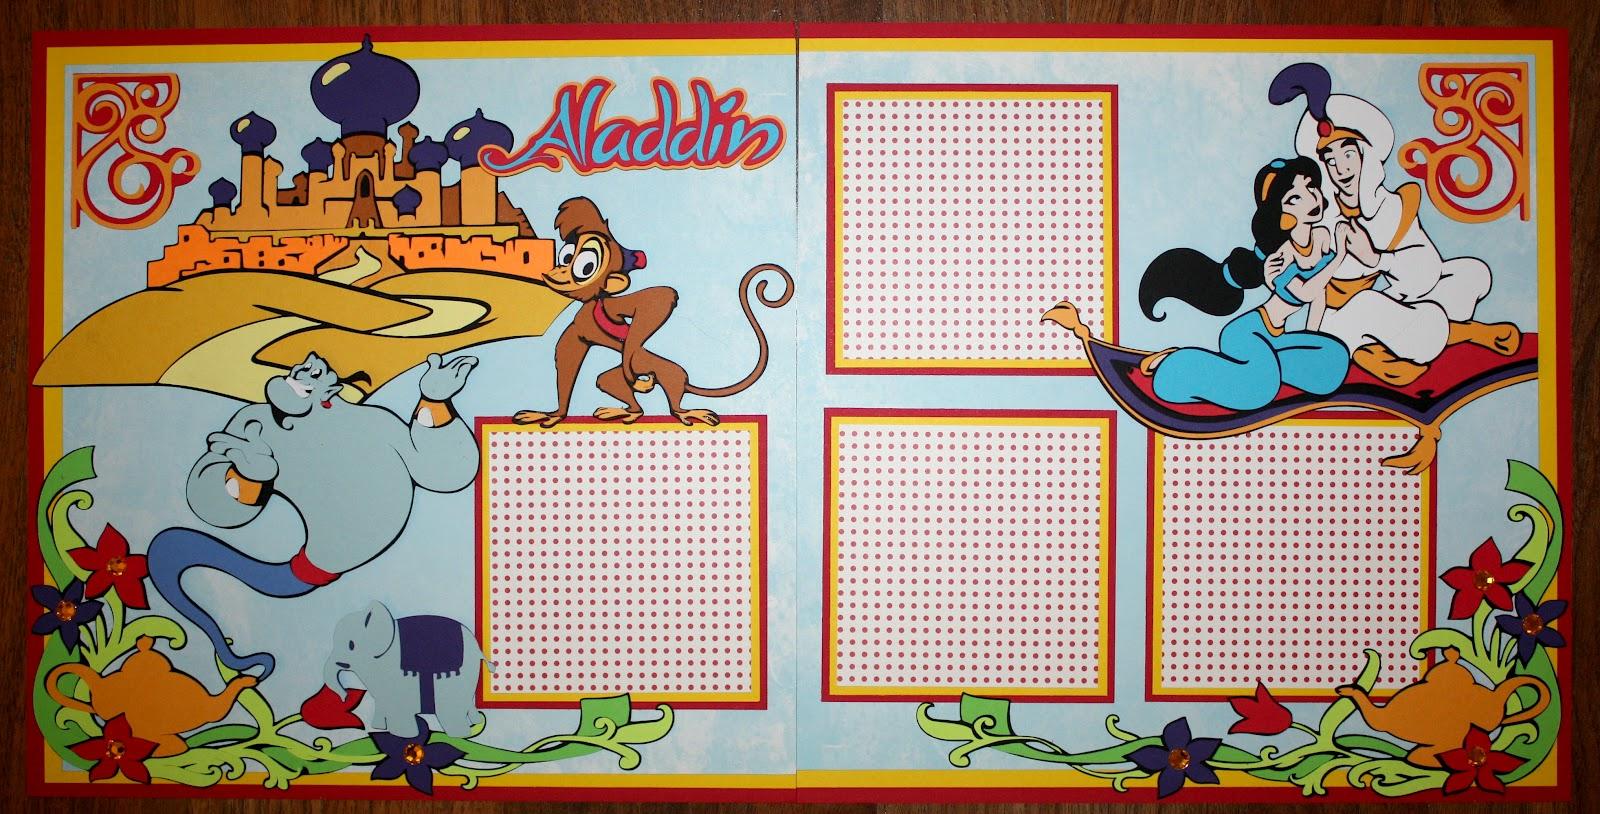 Disney scrapbook ideas - Aladdin 12x12 Double Scrapbook Layout